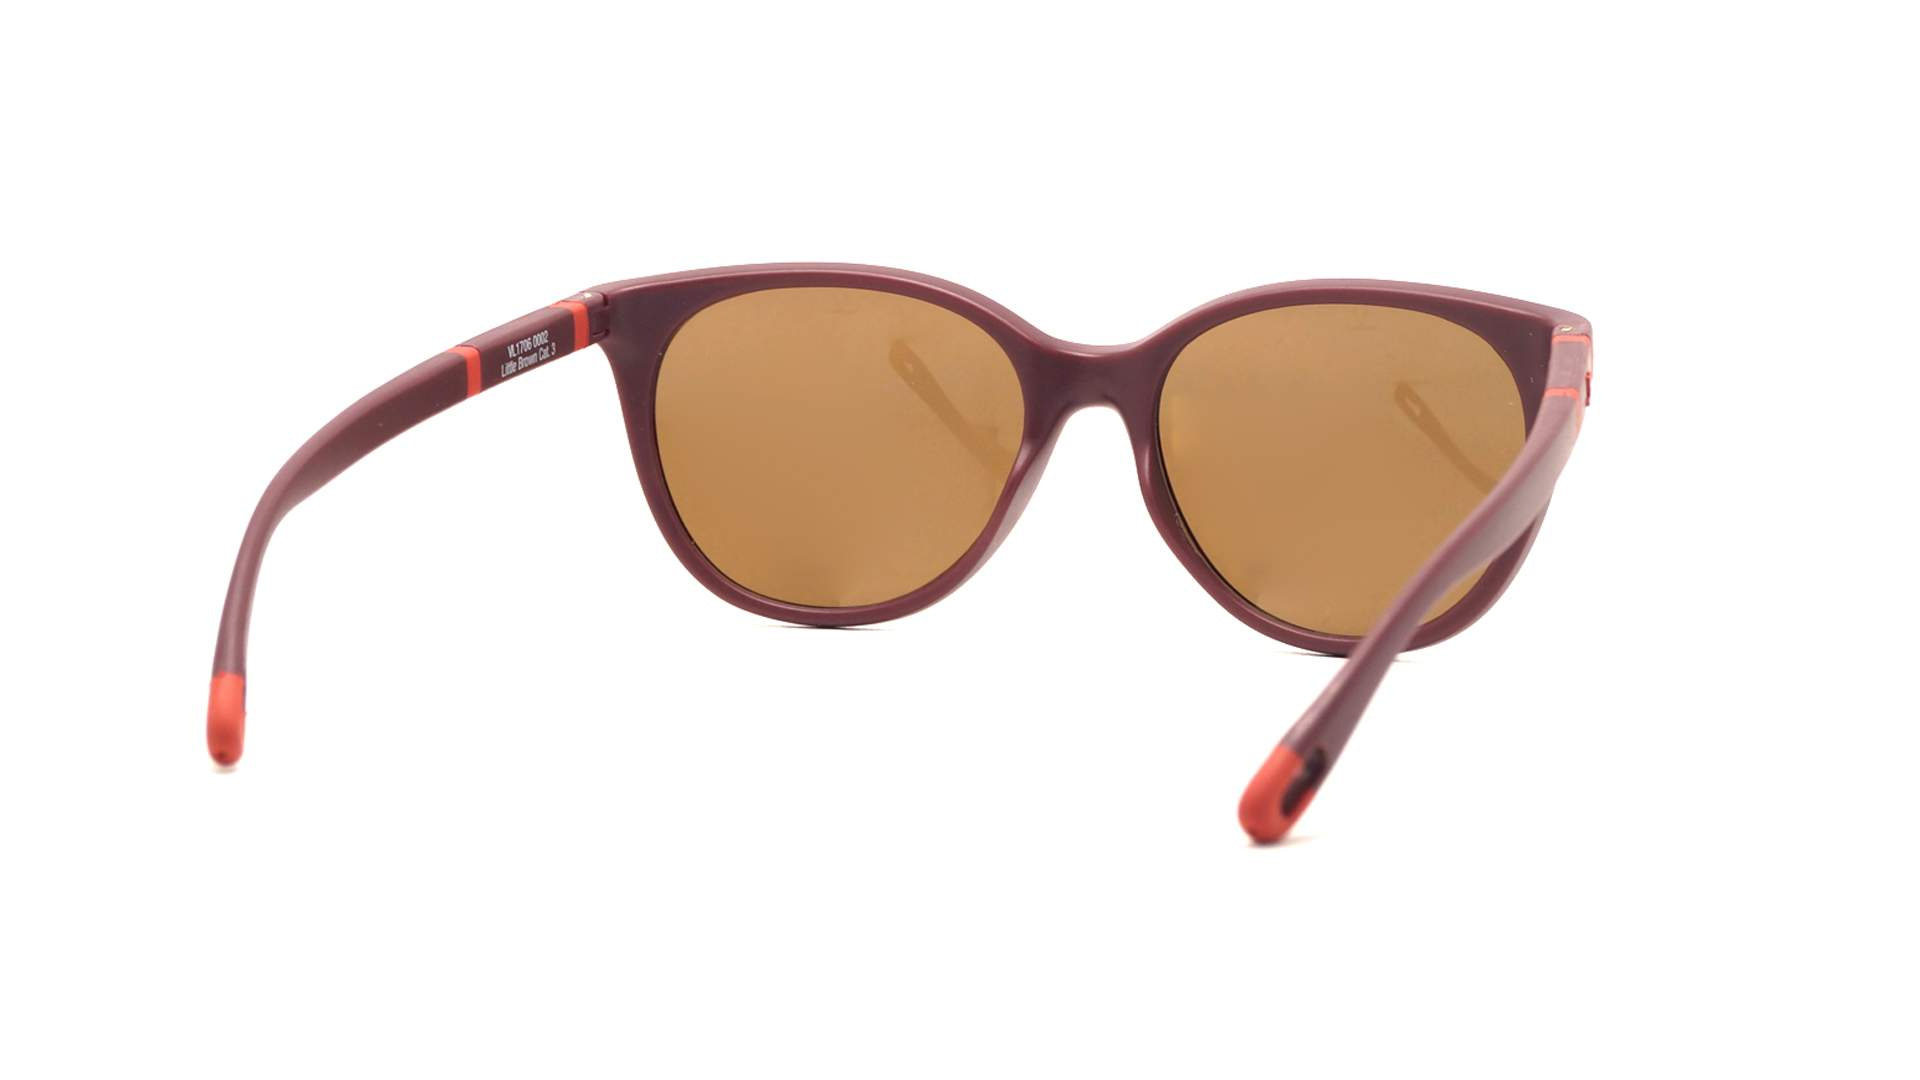 31485ff8e2d Sunglasses vuarnet cat eye kids purple matte junior jpg 1920x1080 Vuarnet  cat eyes